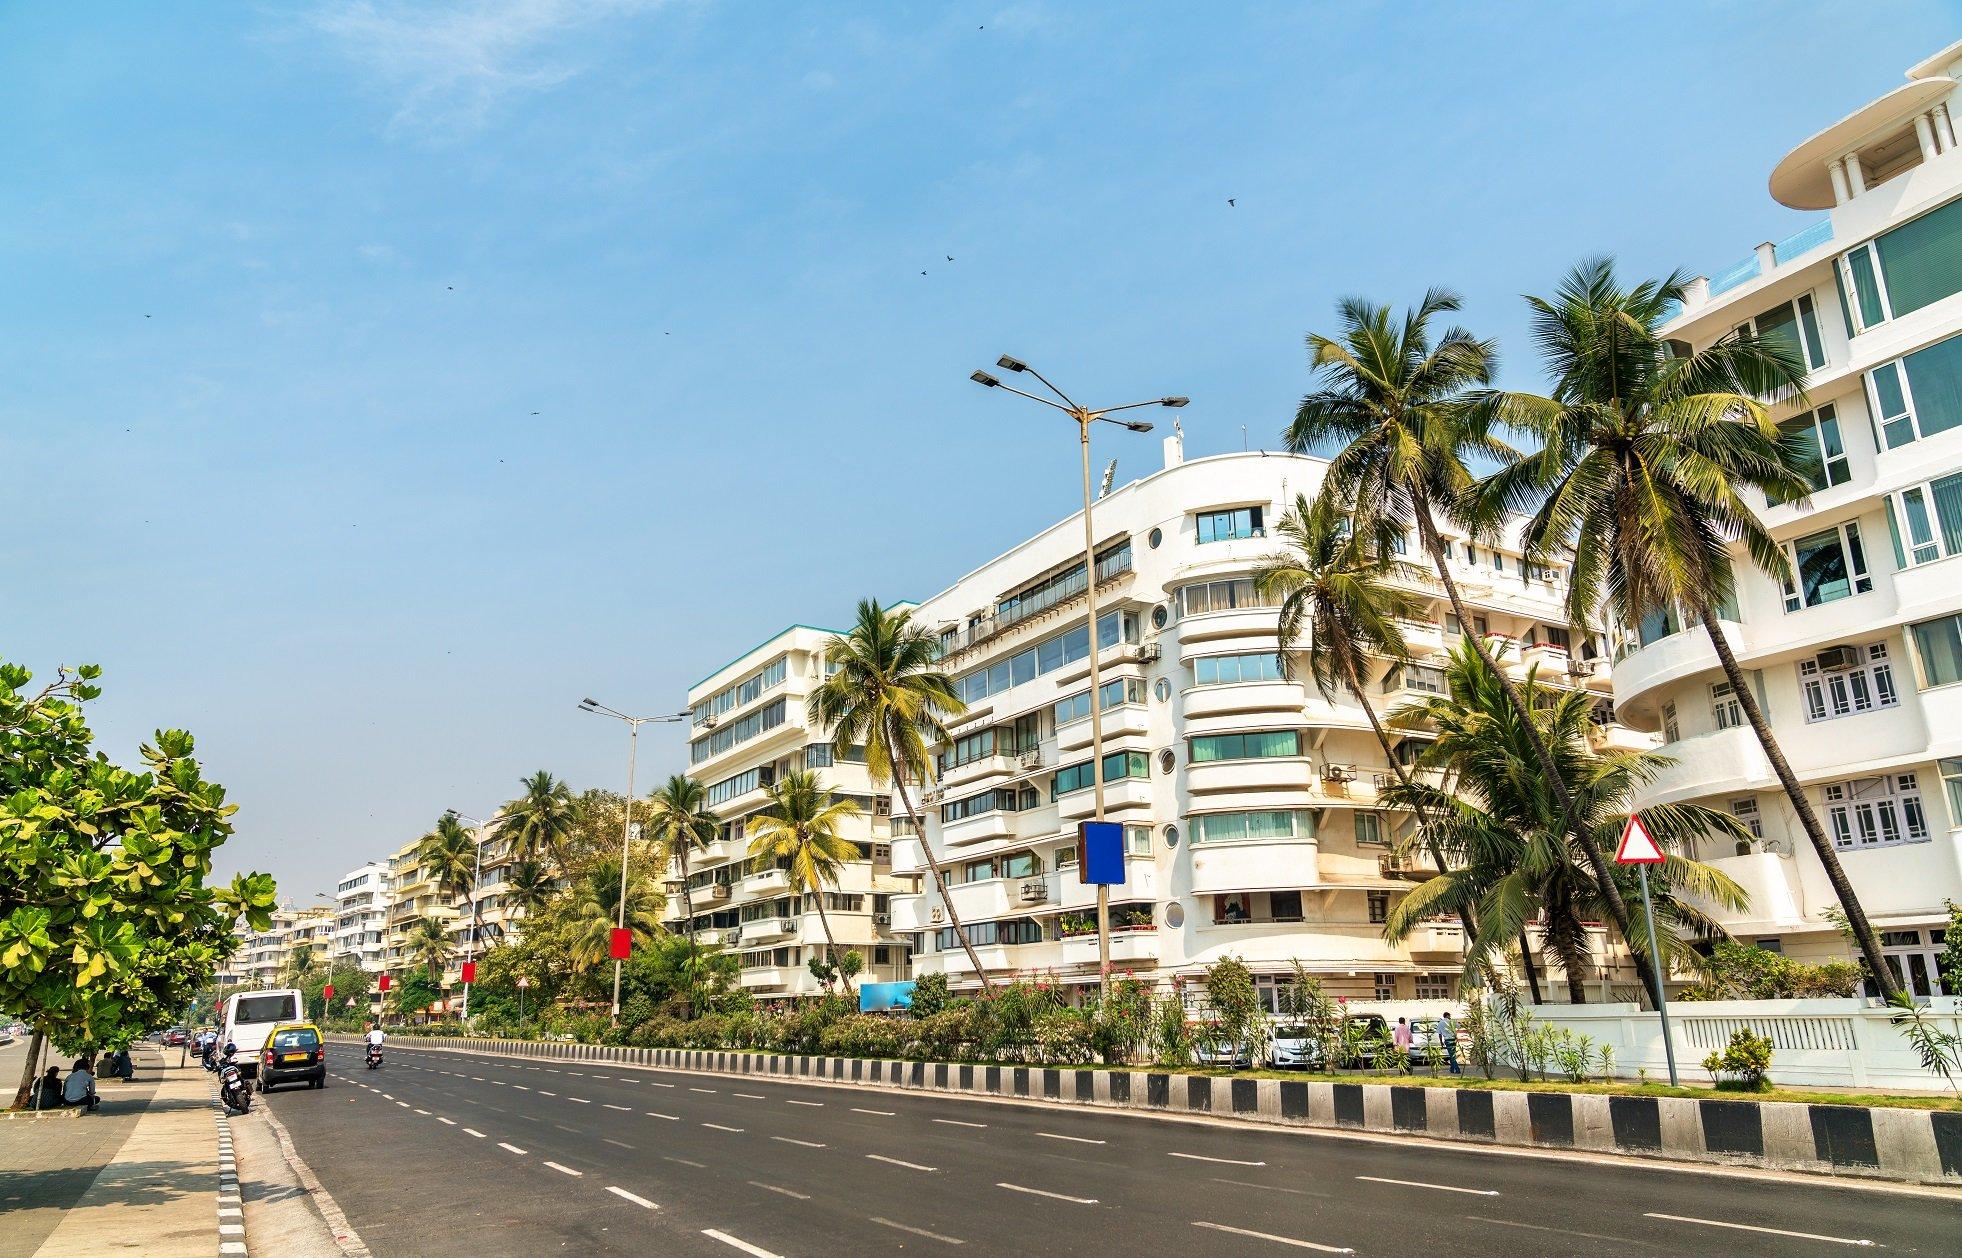 Design is not hard to find on Marine Drive Mumbai